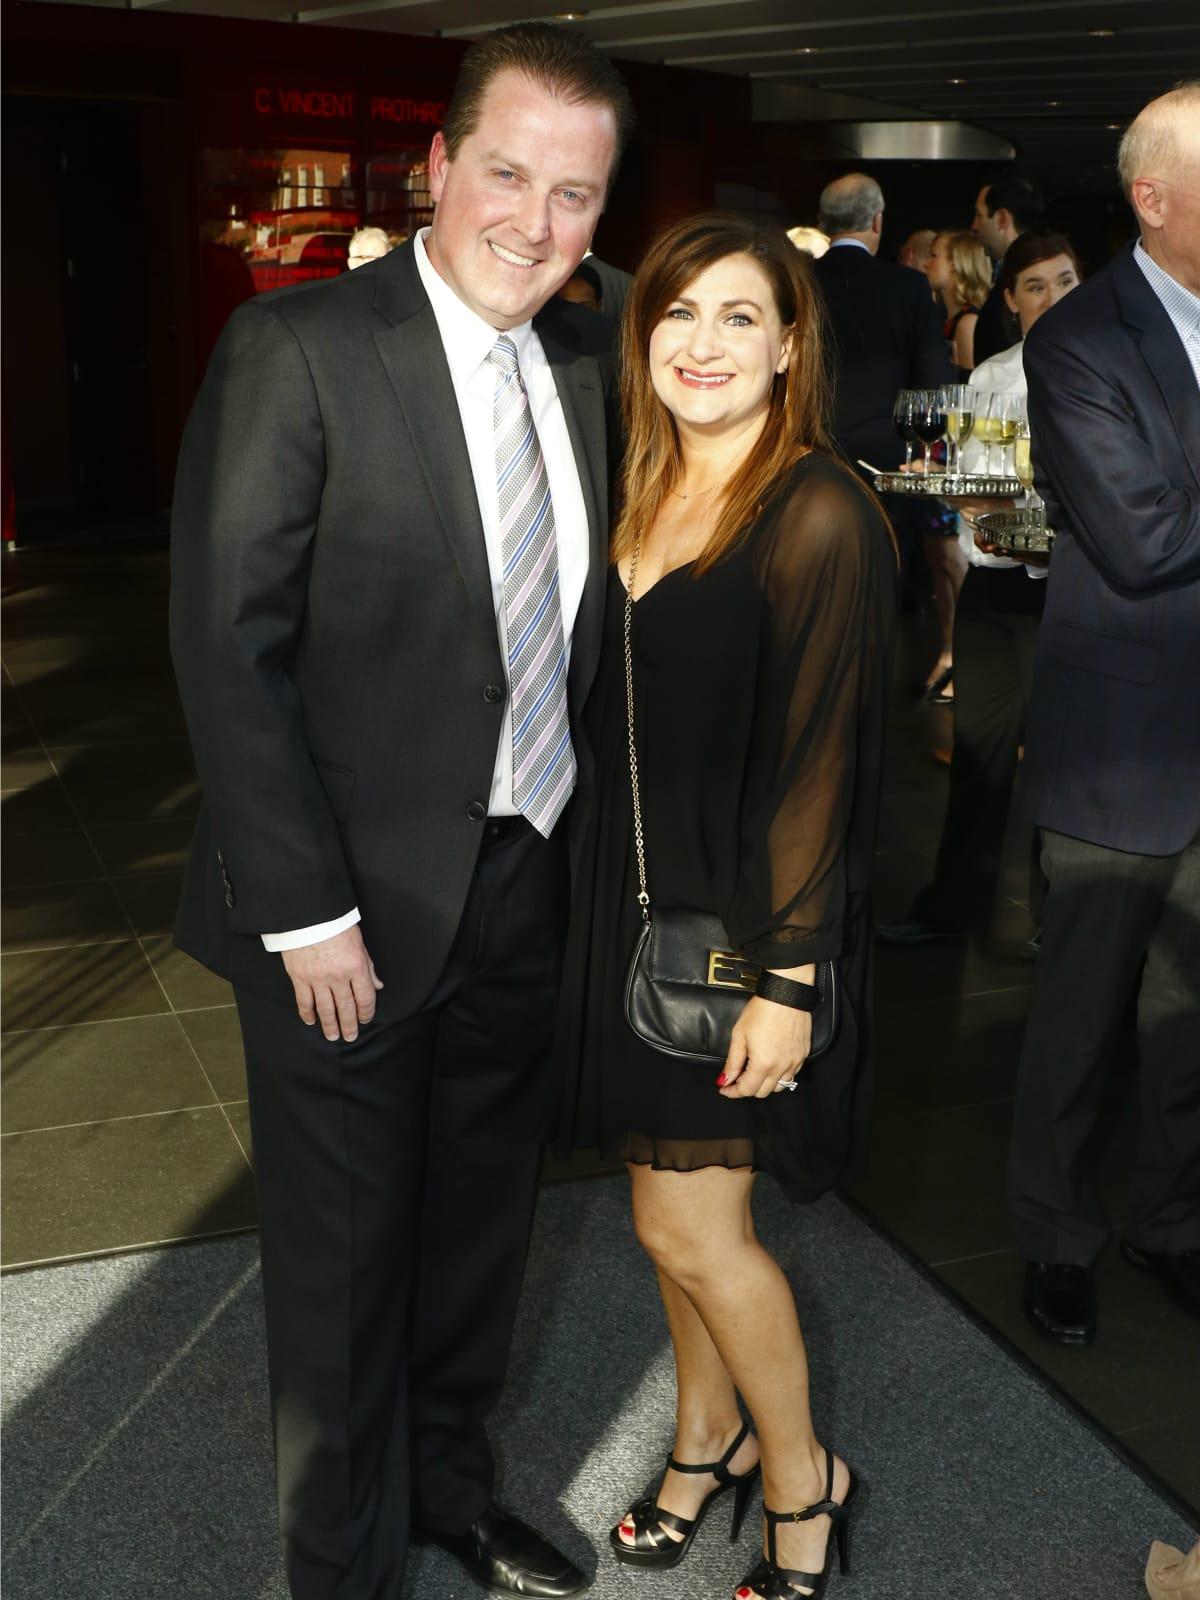 Matt Hickey, Jennifer Hickey